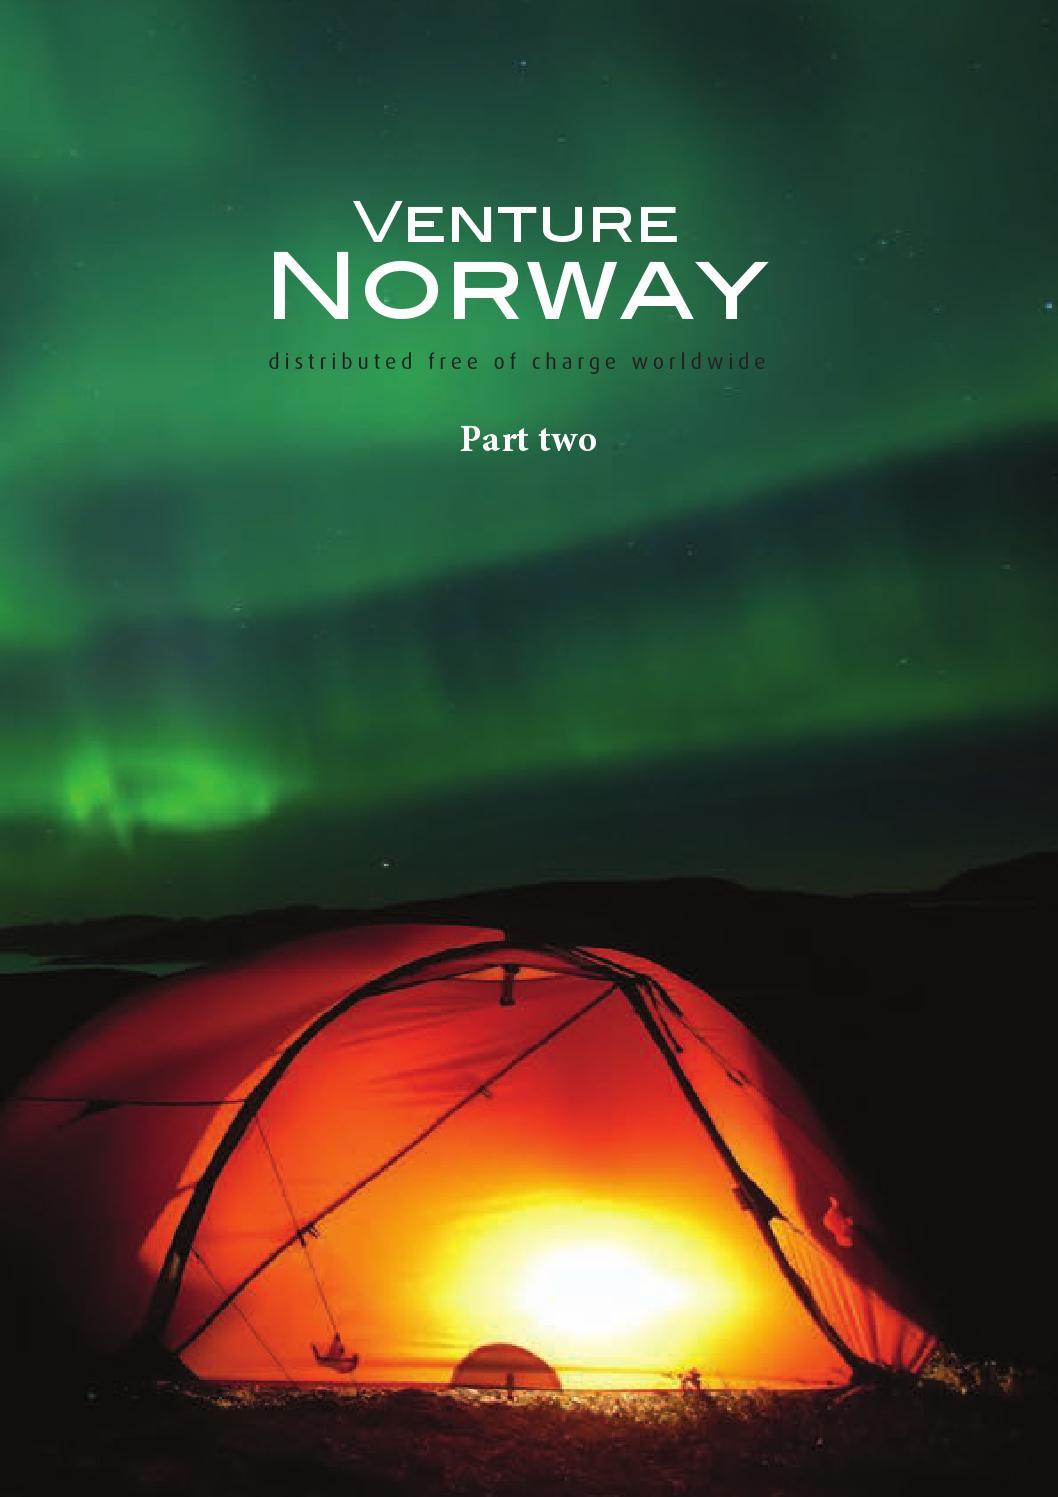 paradise hotel norge 2013 norsk amatørporno